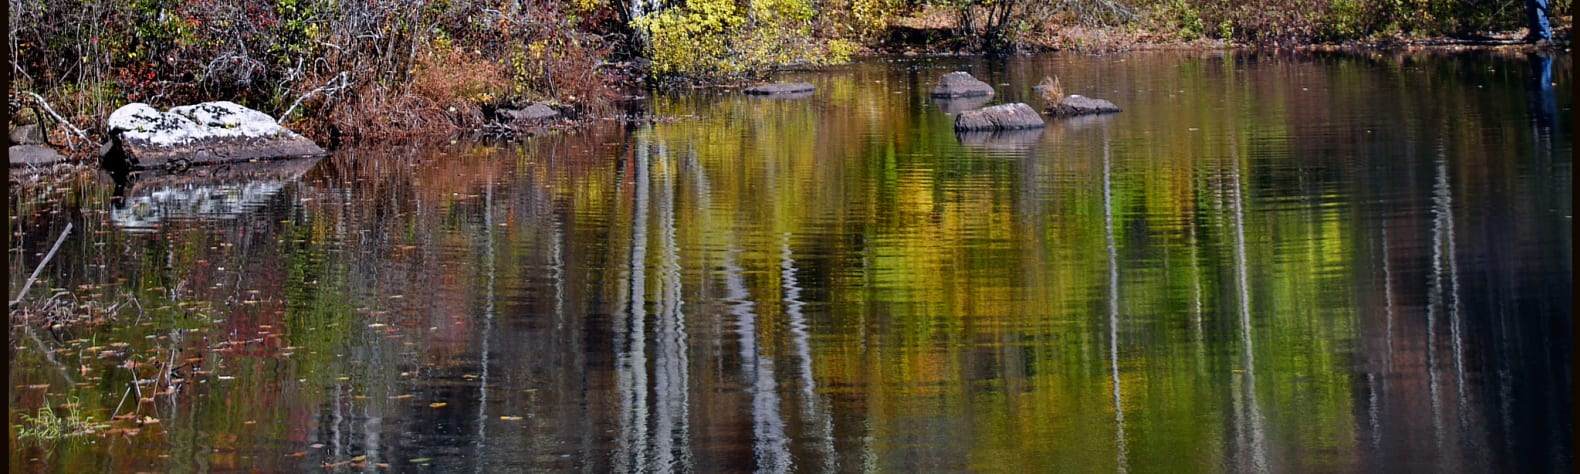 Devil's Hopyard State Park